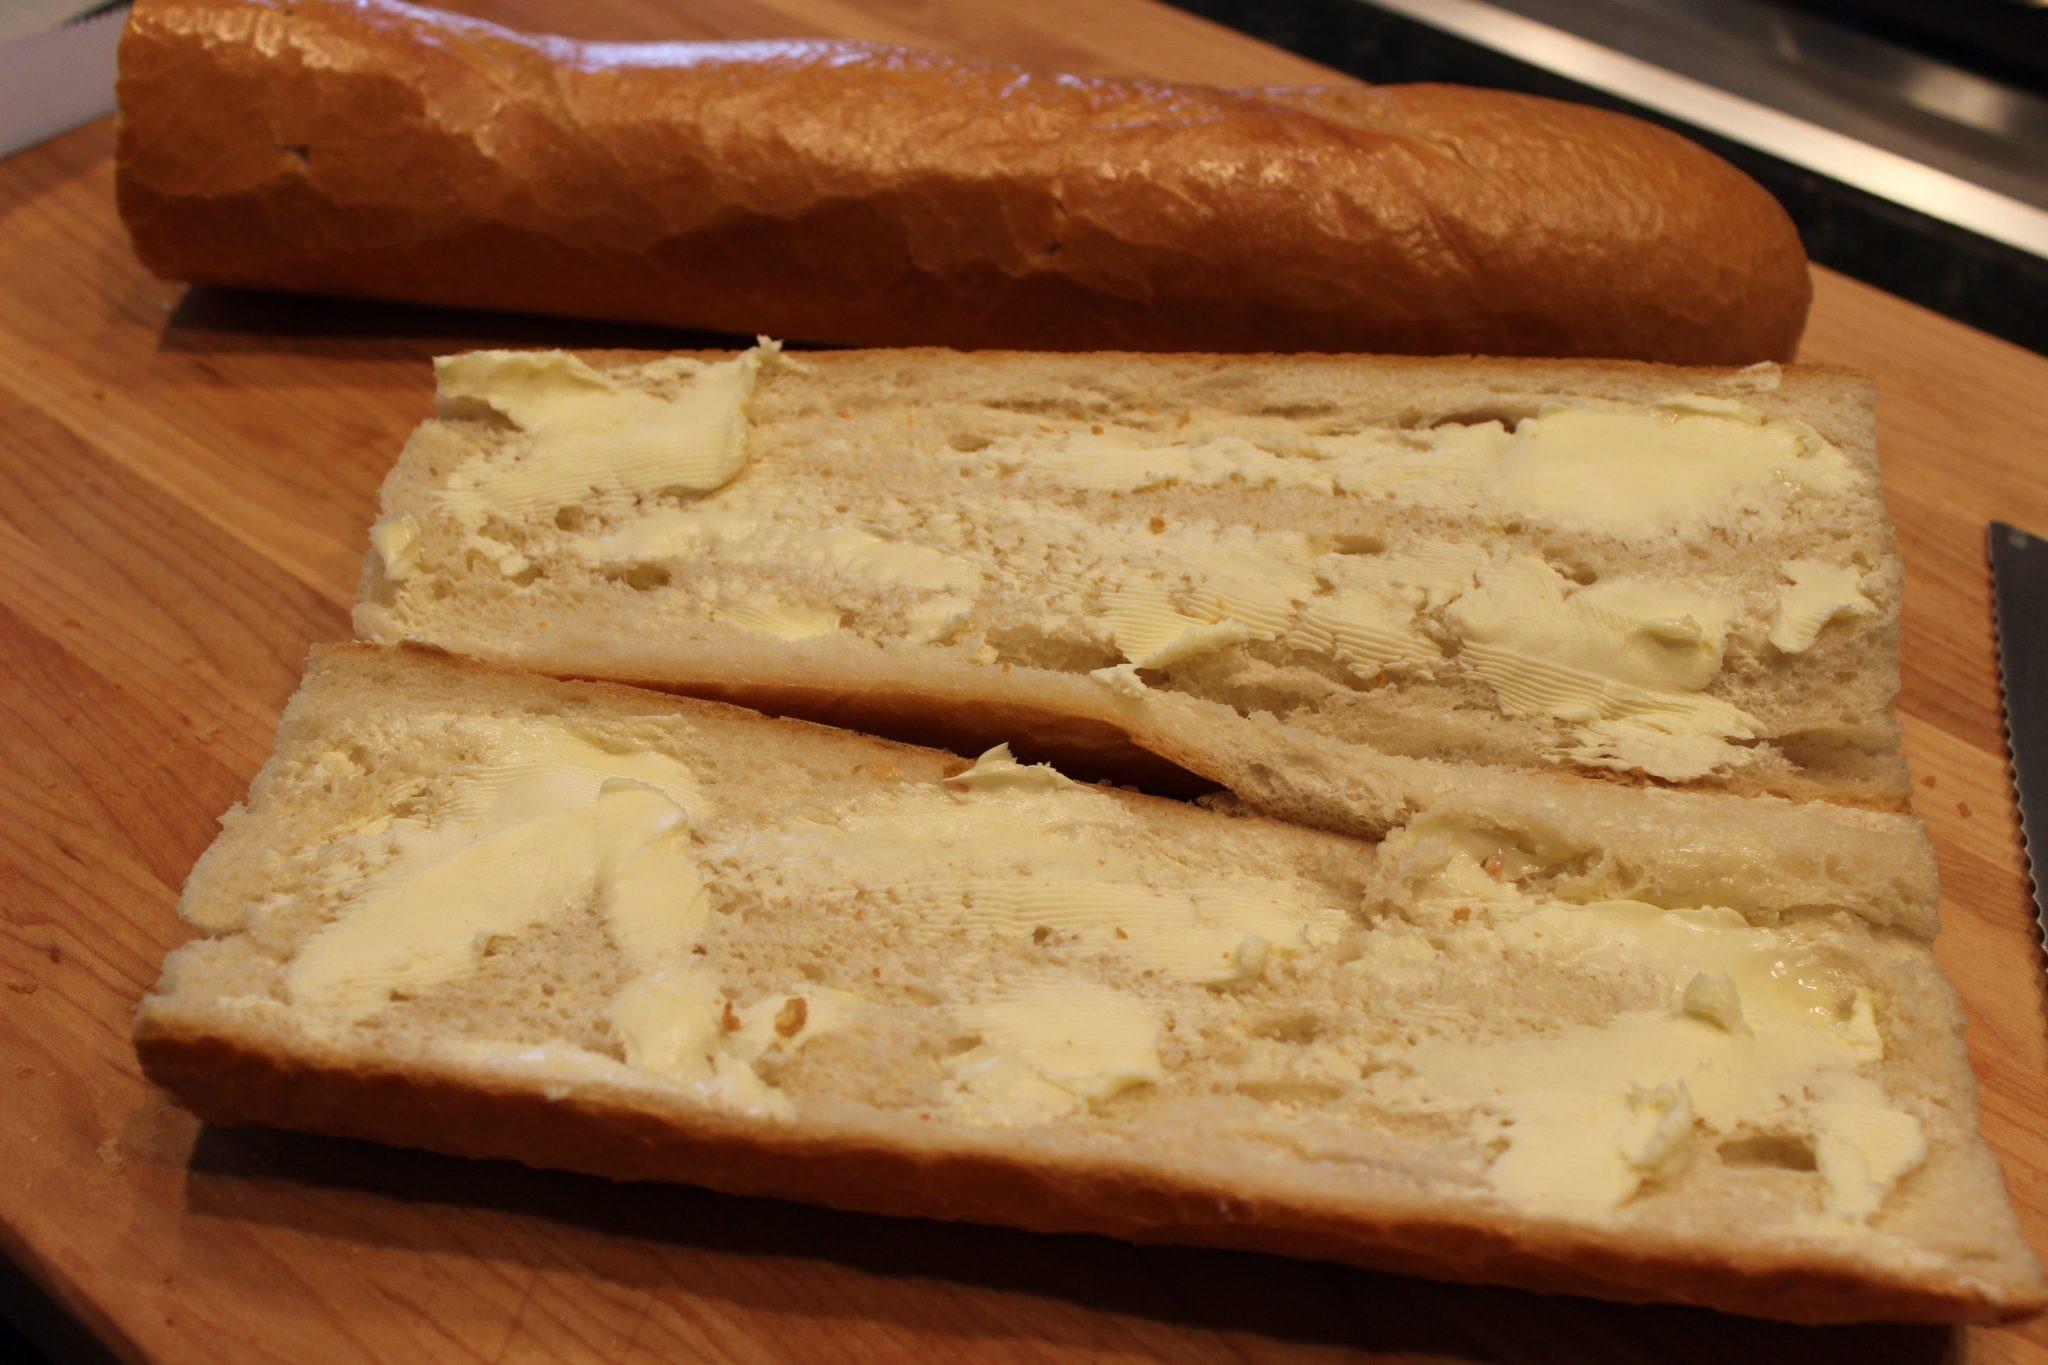 Garlic Bread With Garlic Powder  Best Garlic Bread in the World – Homemade Italian Cooking